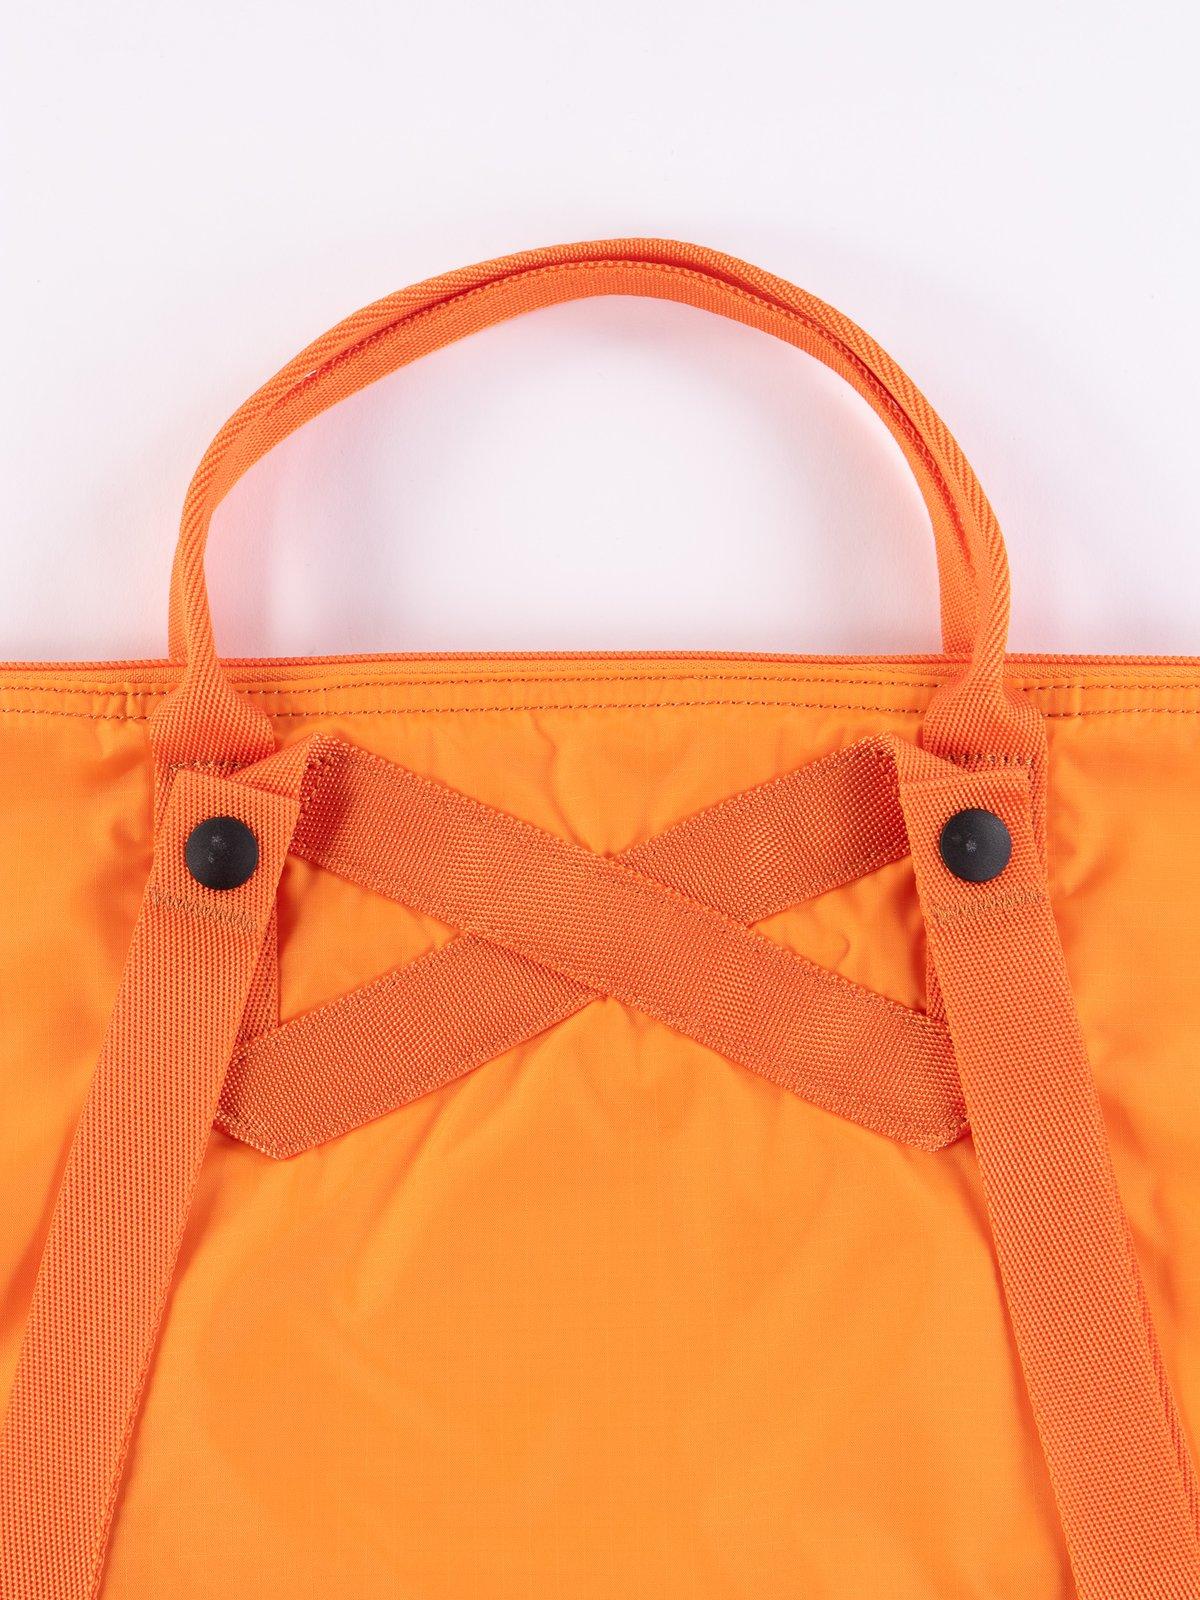 Orange Flex 2Way Tote Bag - Image 4